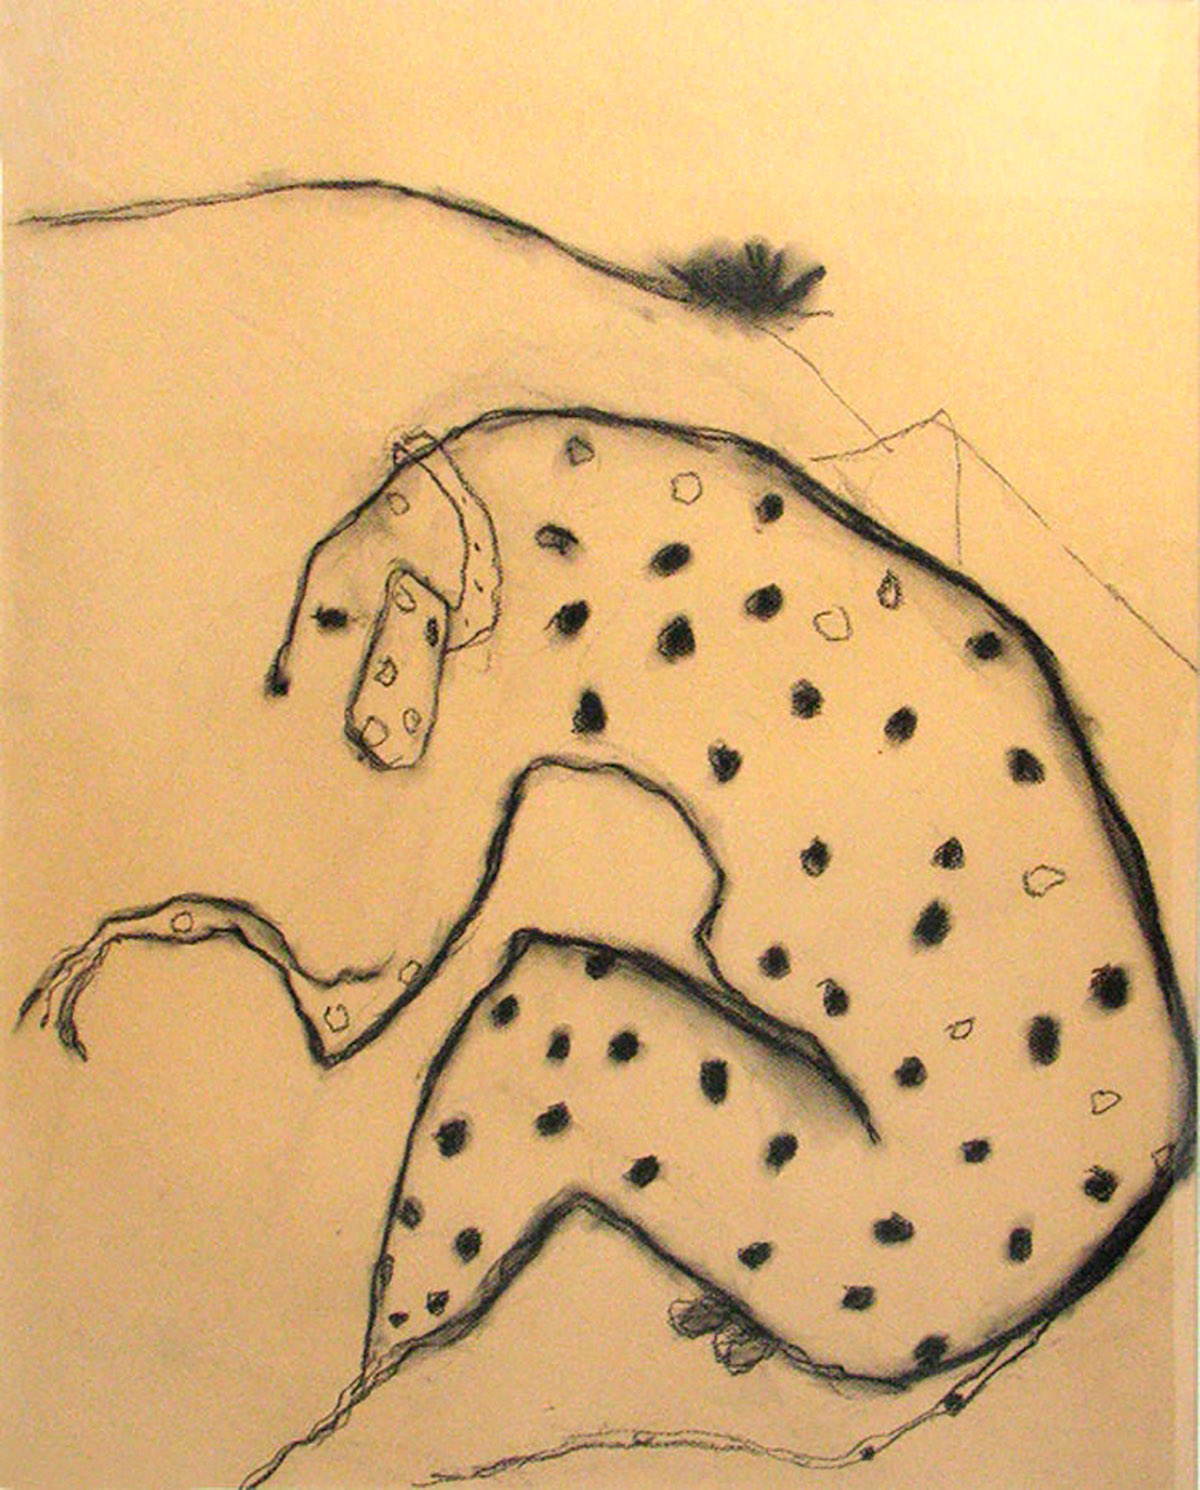 Pat Douthwaite, 'Spotted Dog (Henry Dooley)', pastel